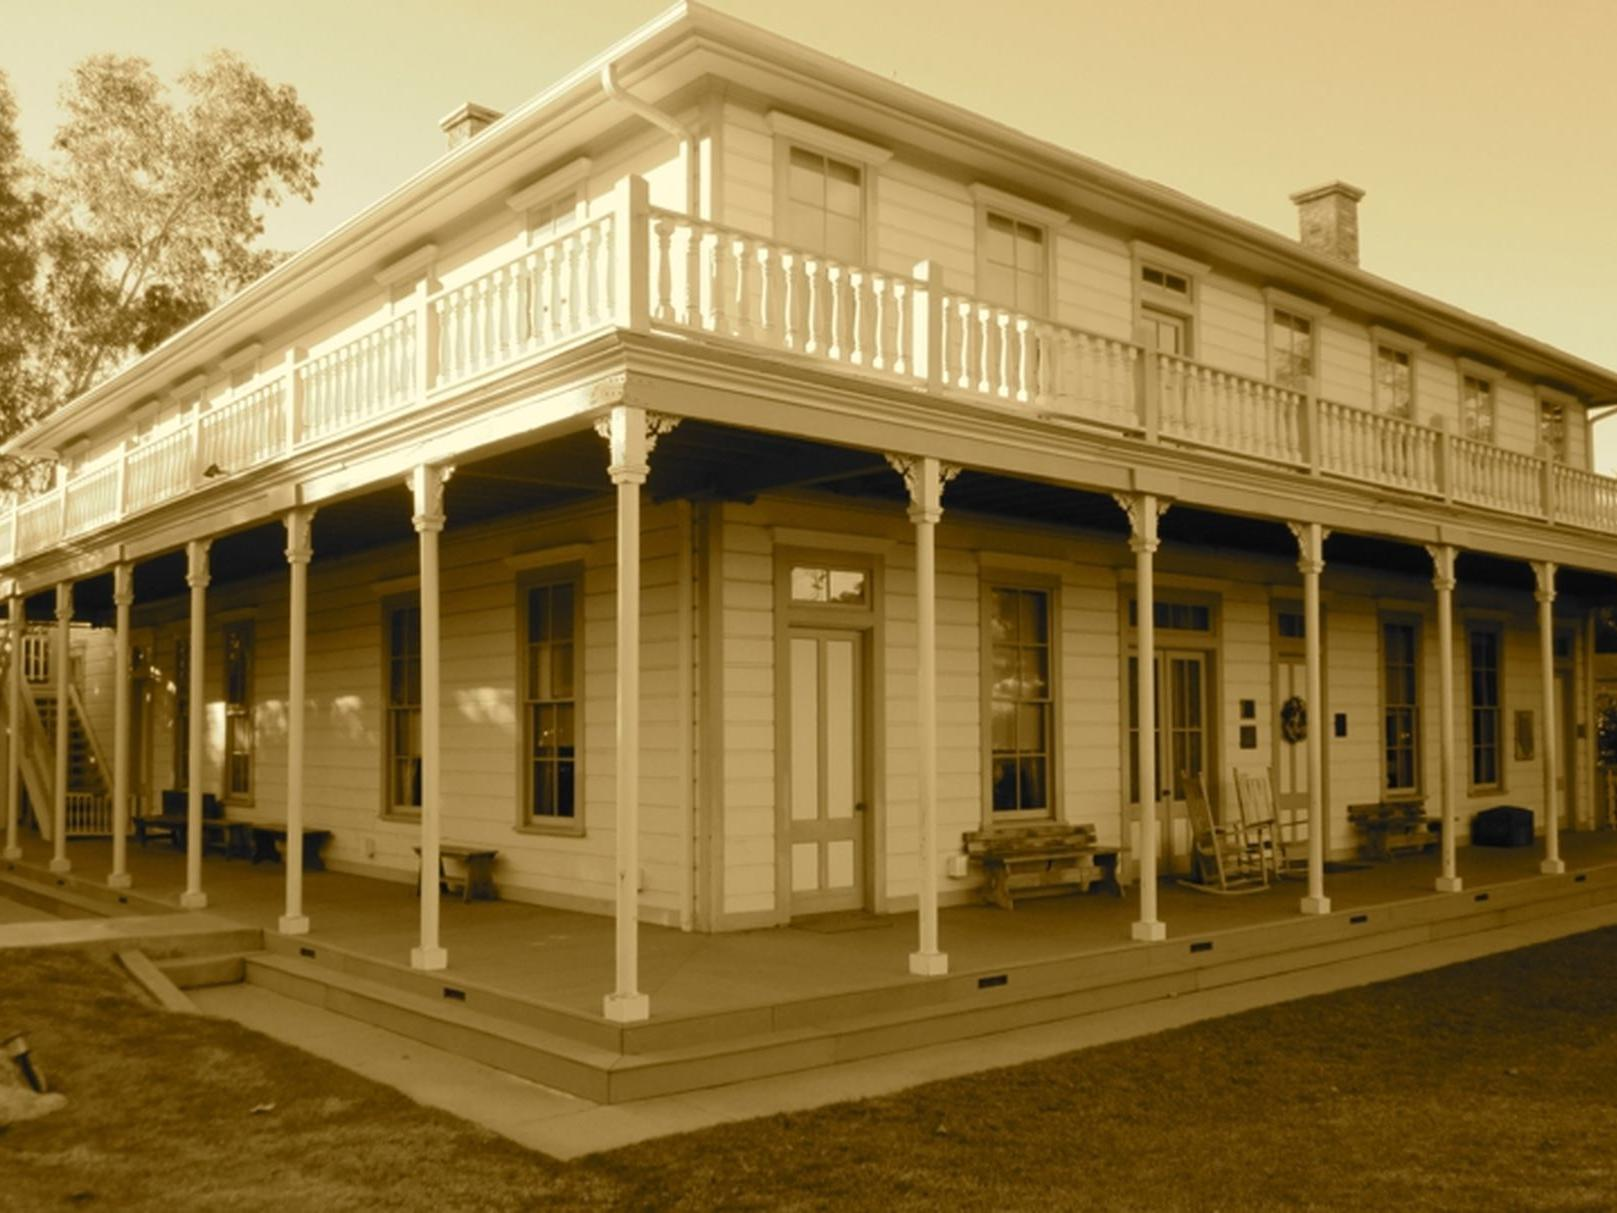 historic looking building